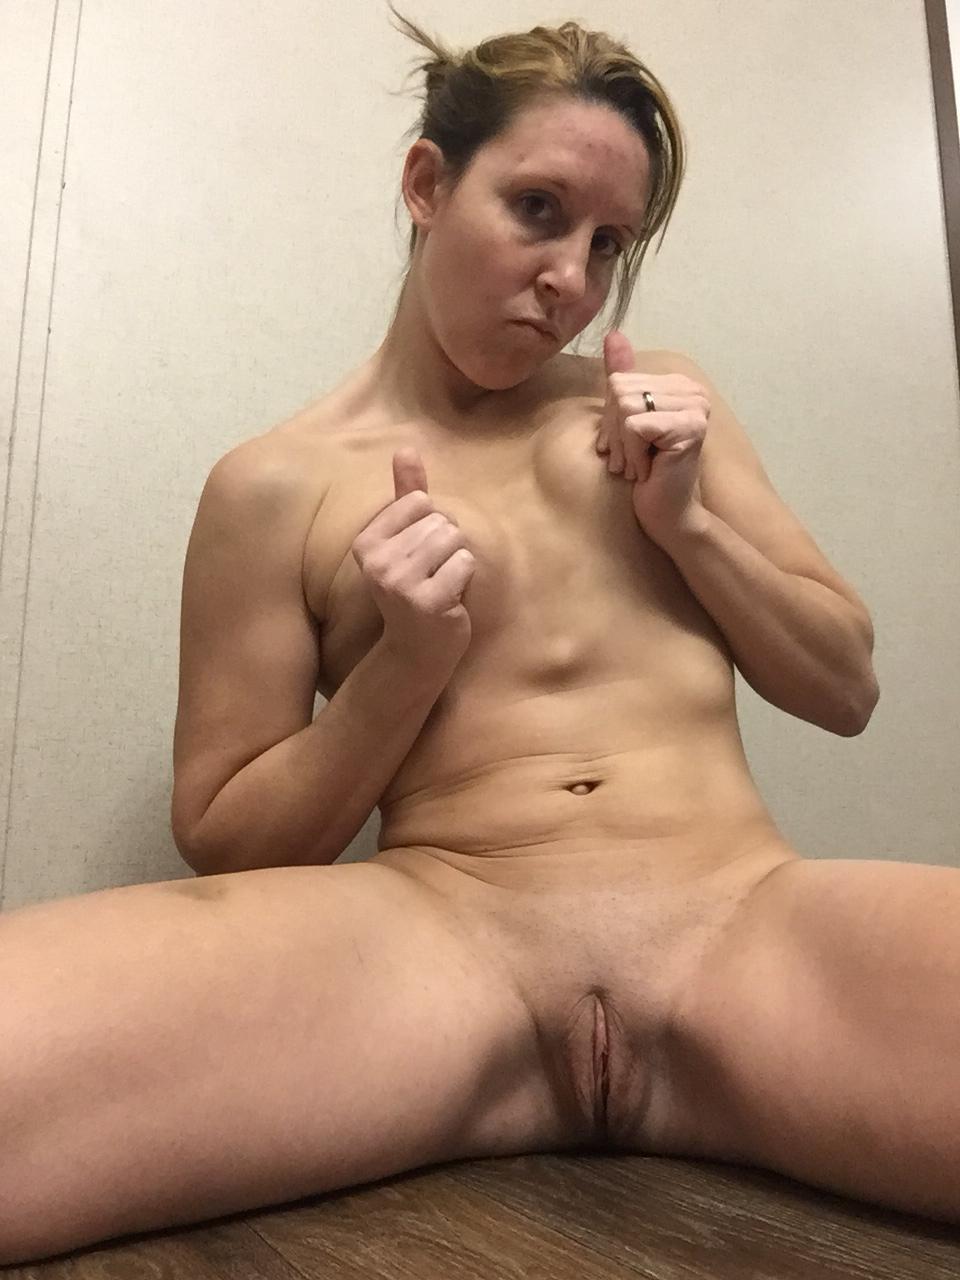 Ebony midget stripper